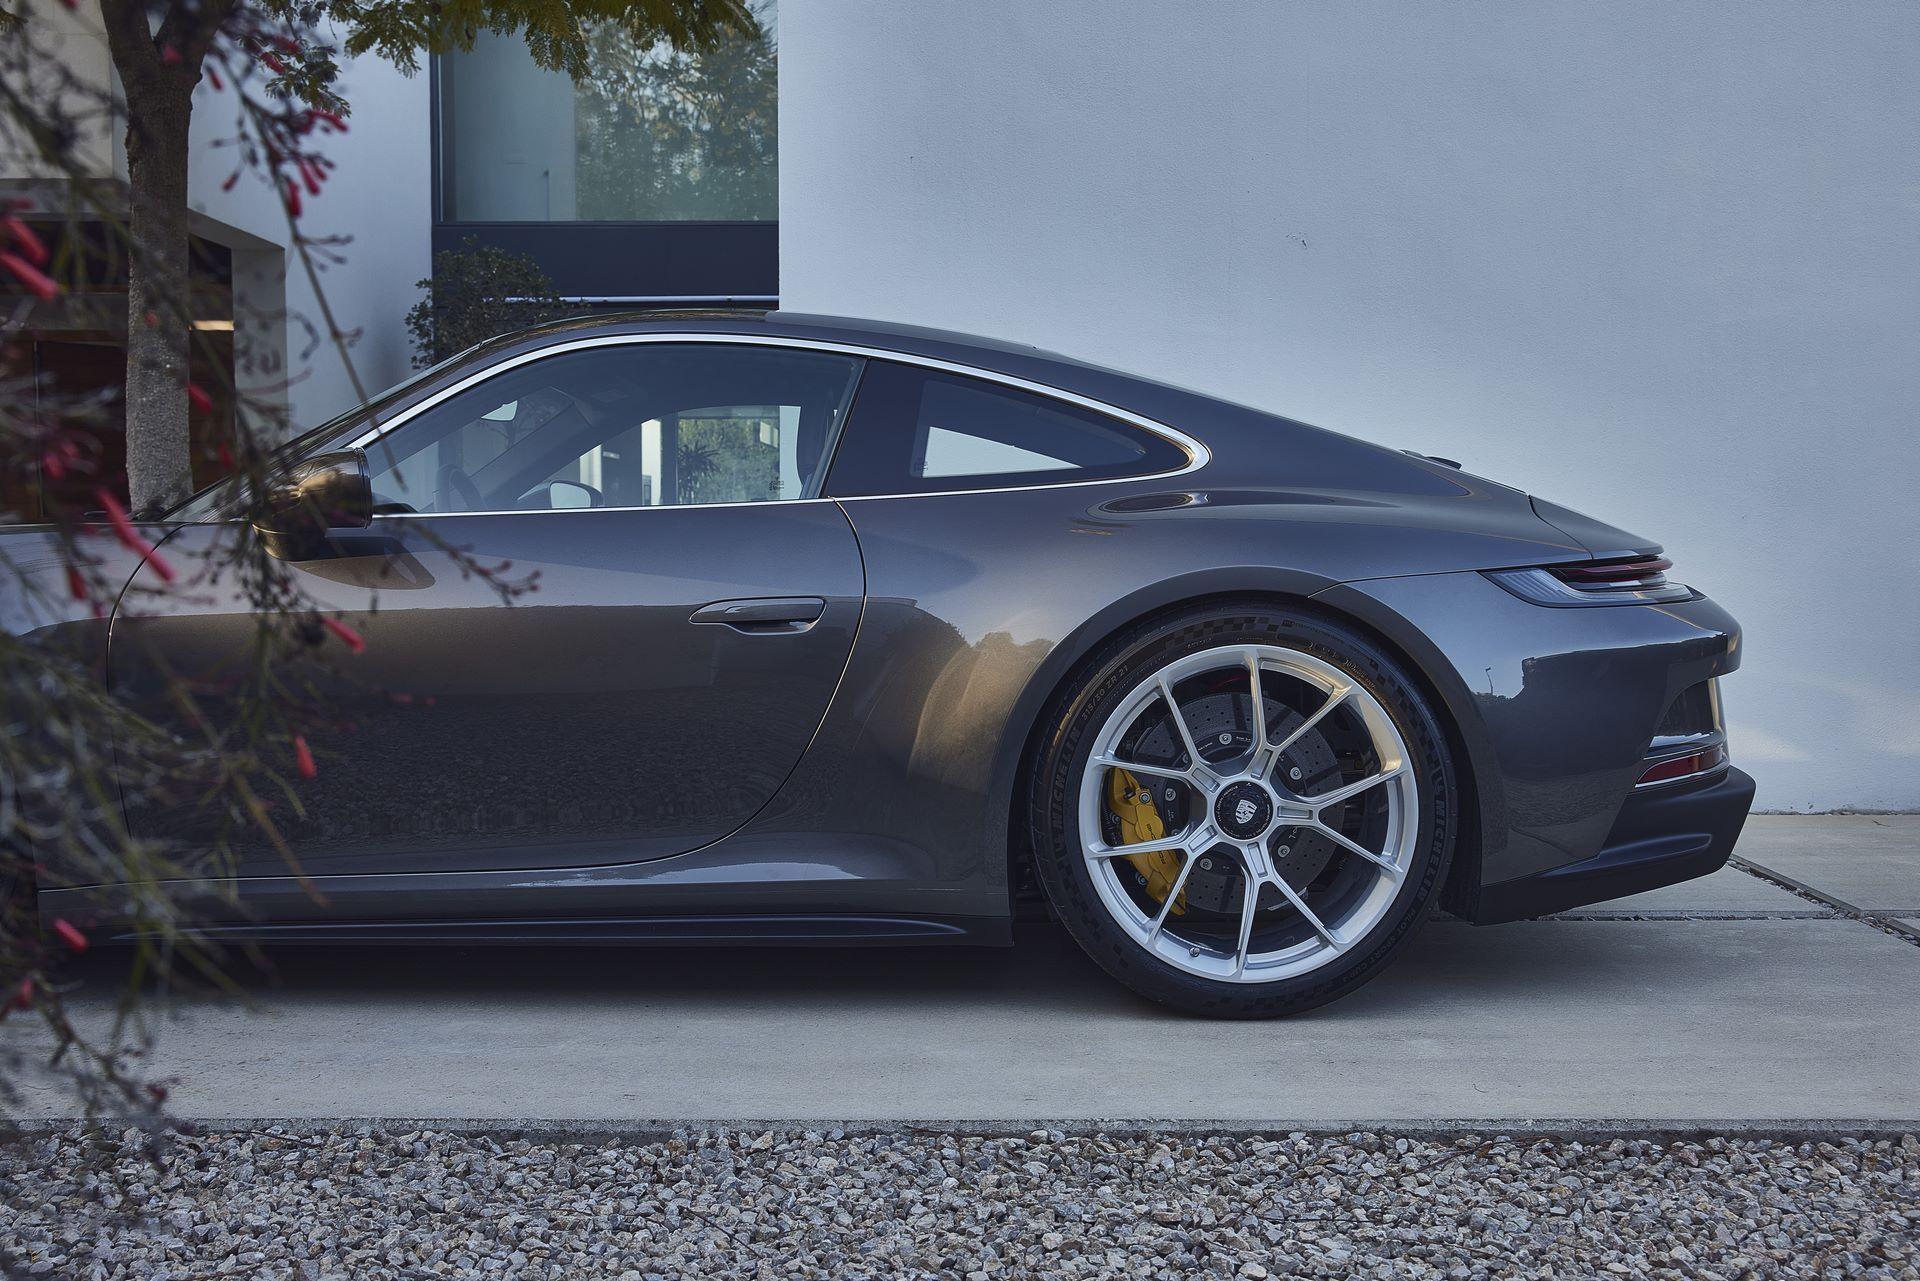 Porsche-911-GT3-Touring-Package-24